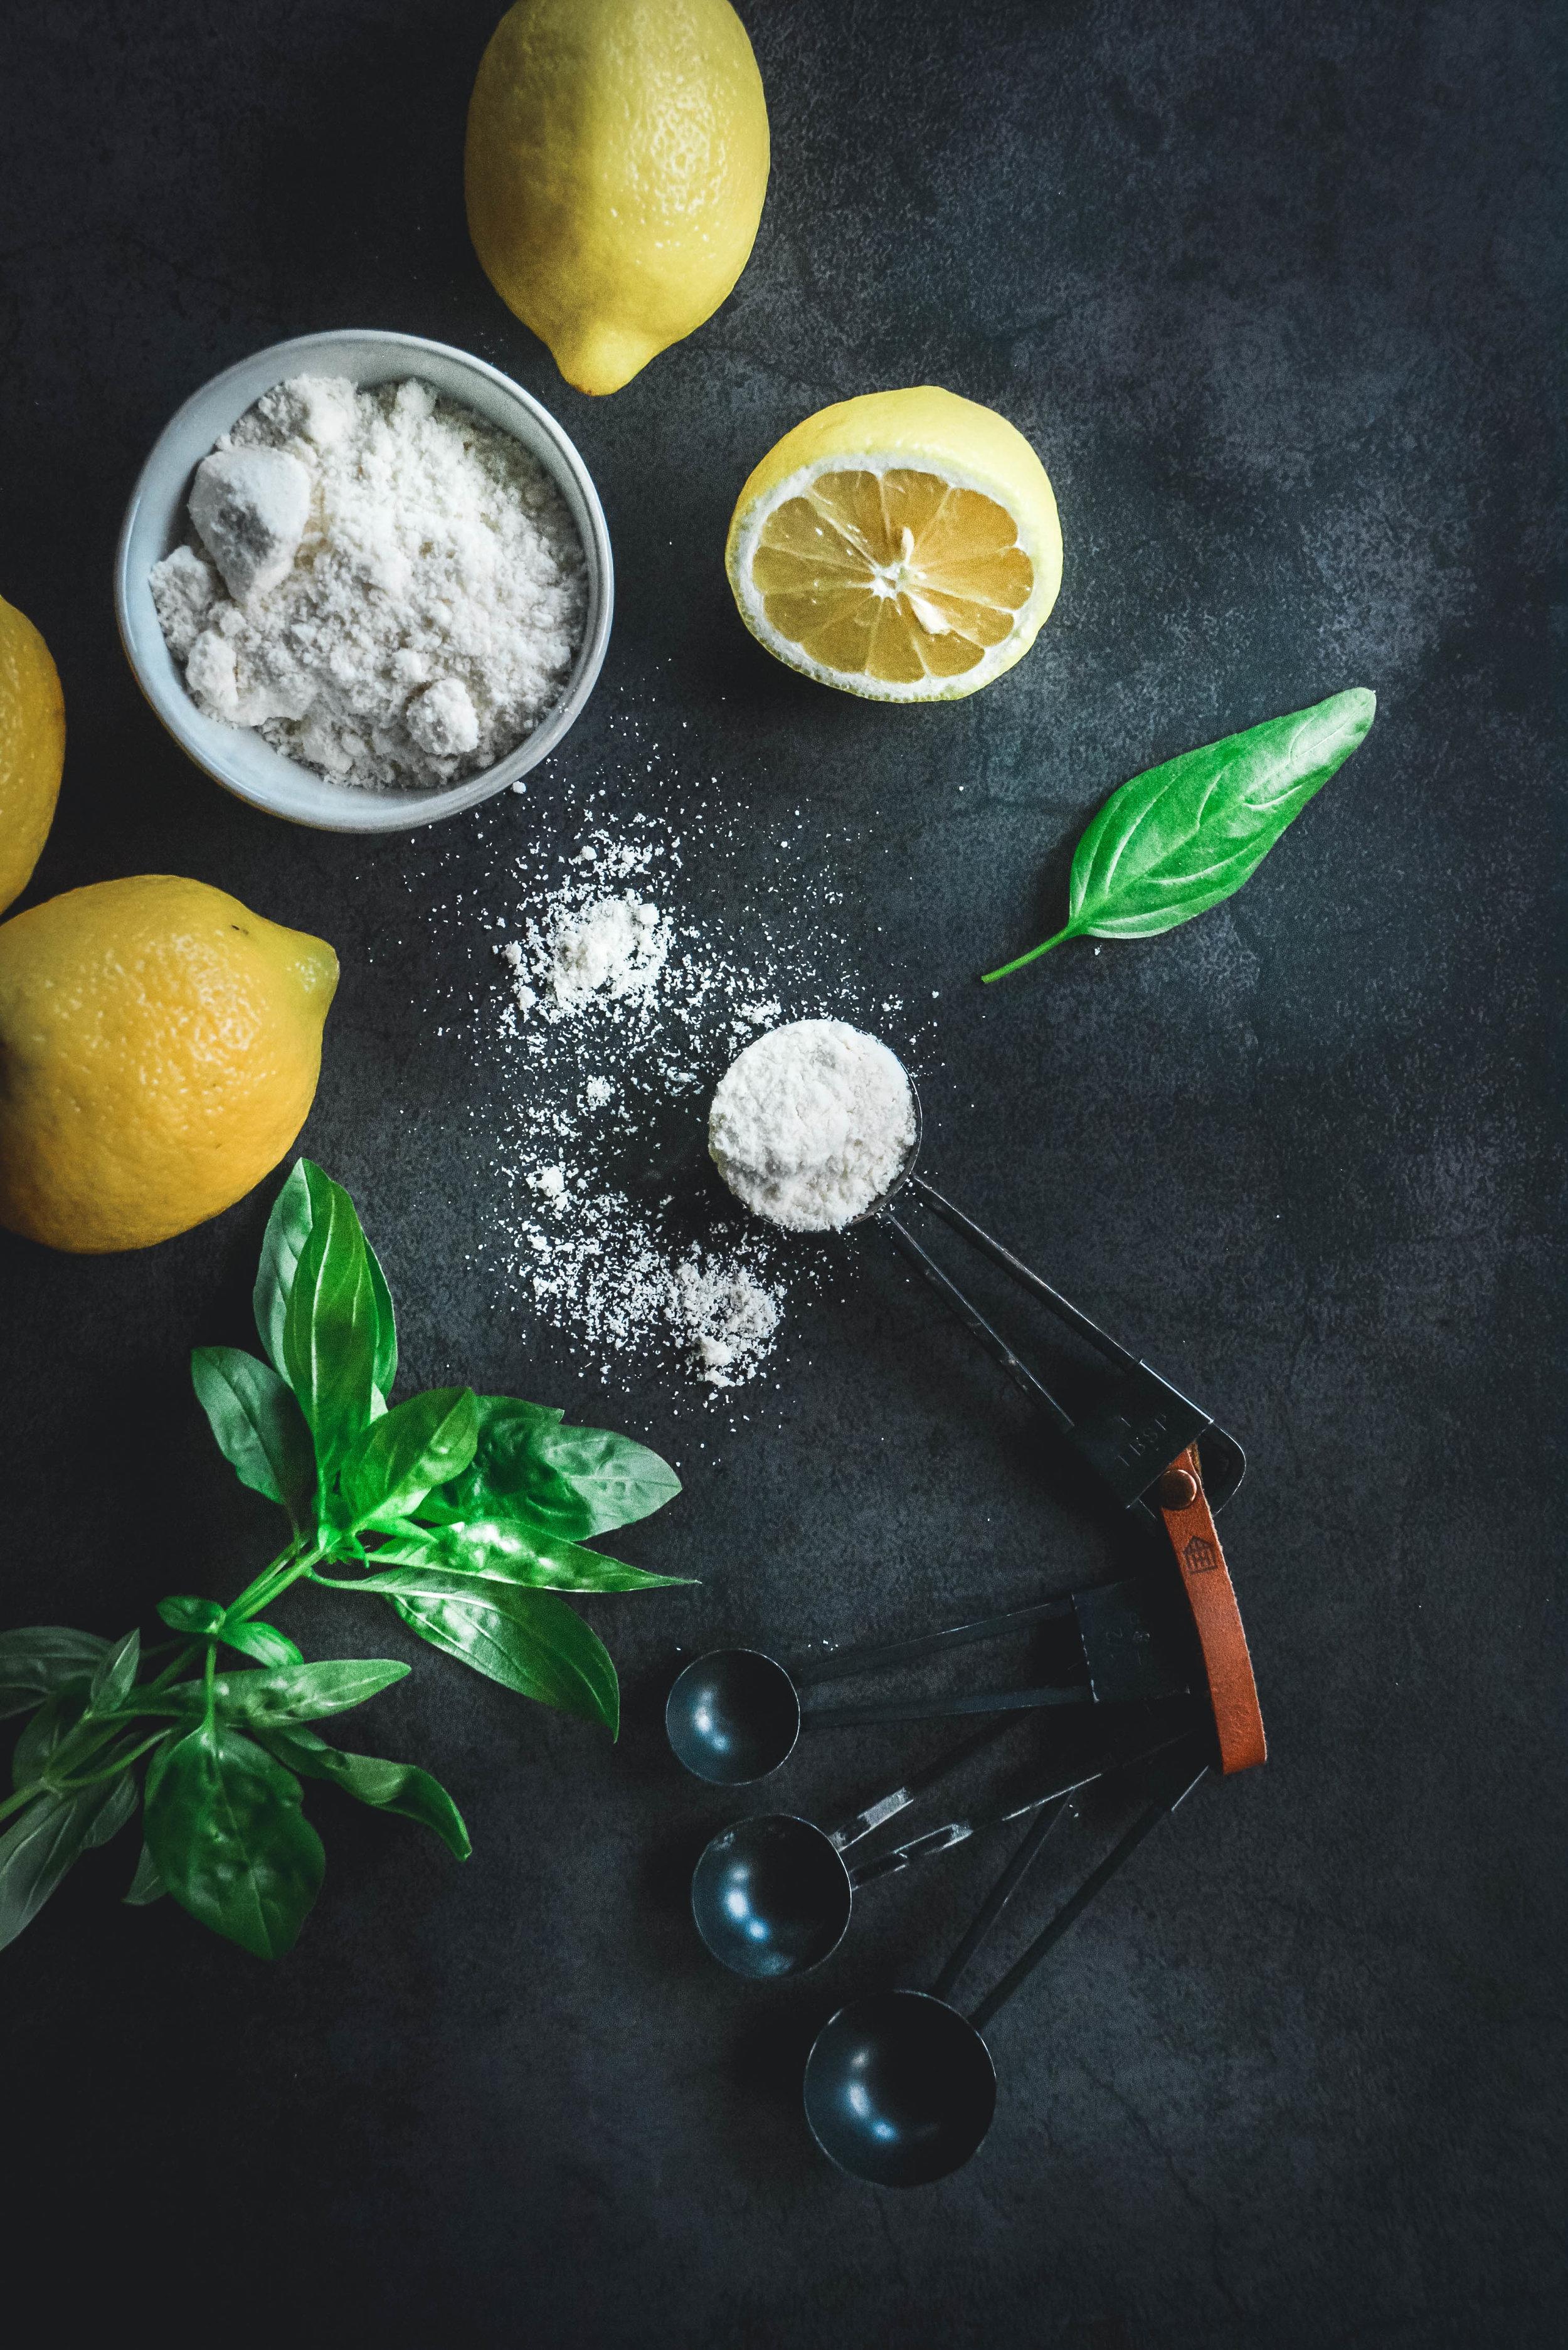 lemons, coconut flour and basil